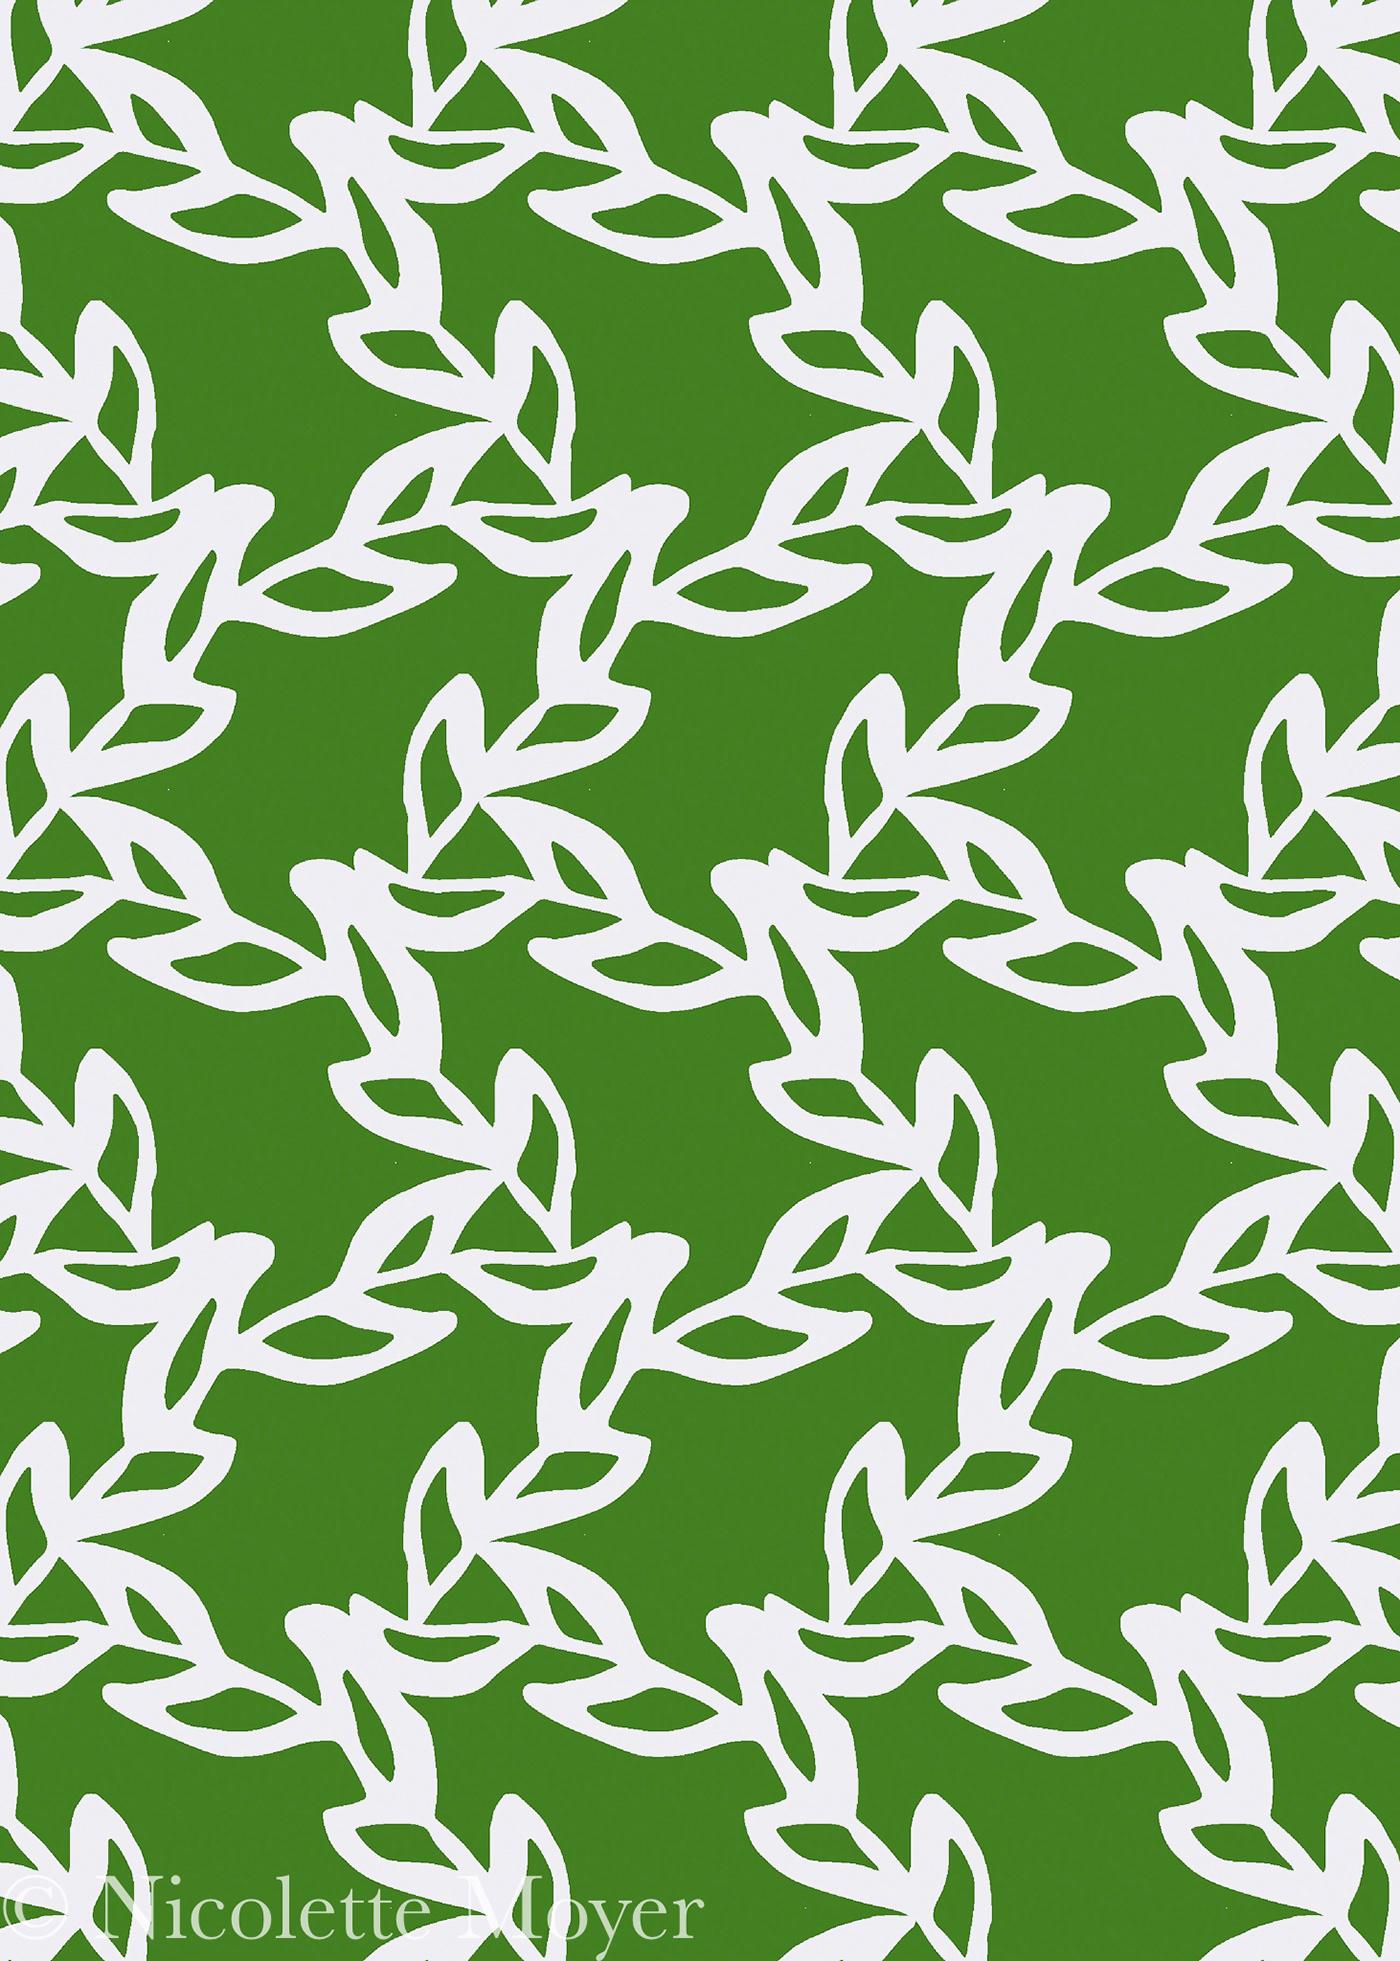 Textiles textiledesign design pattern patternmaking designer digital Digital Art